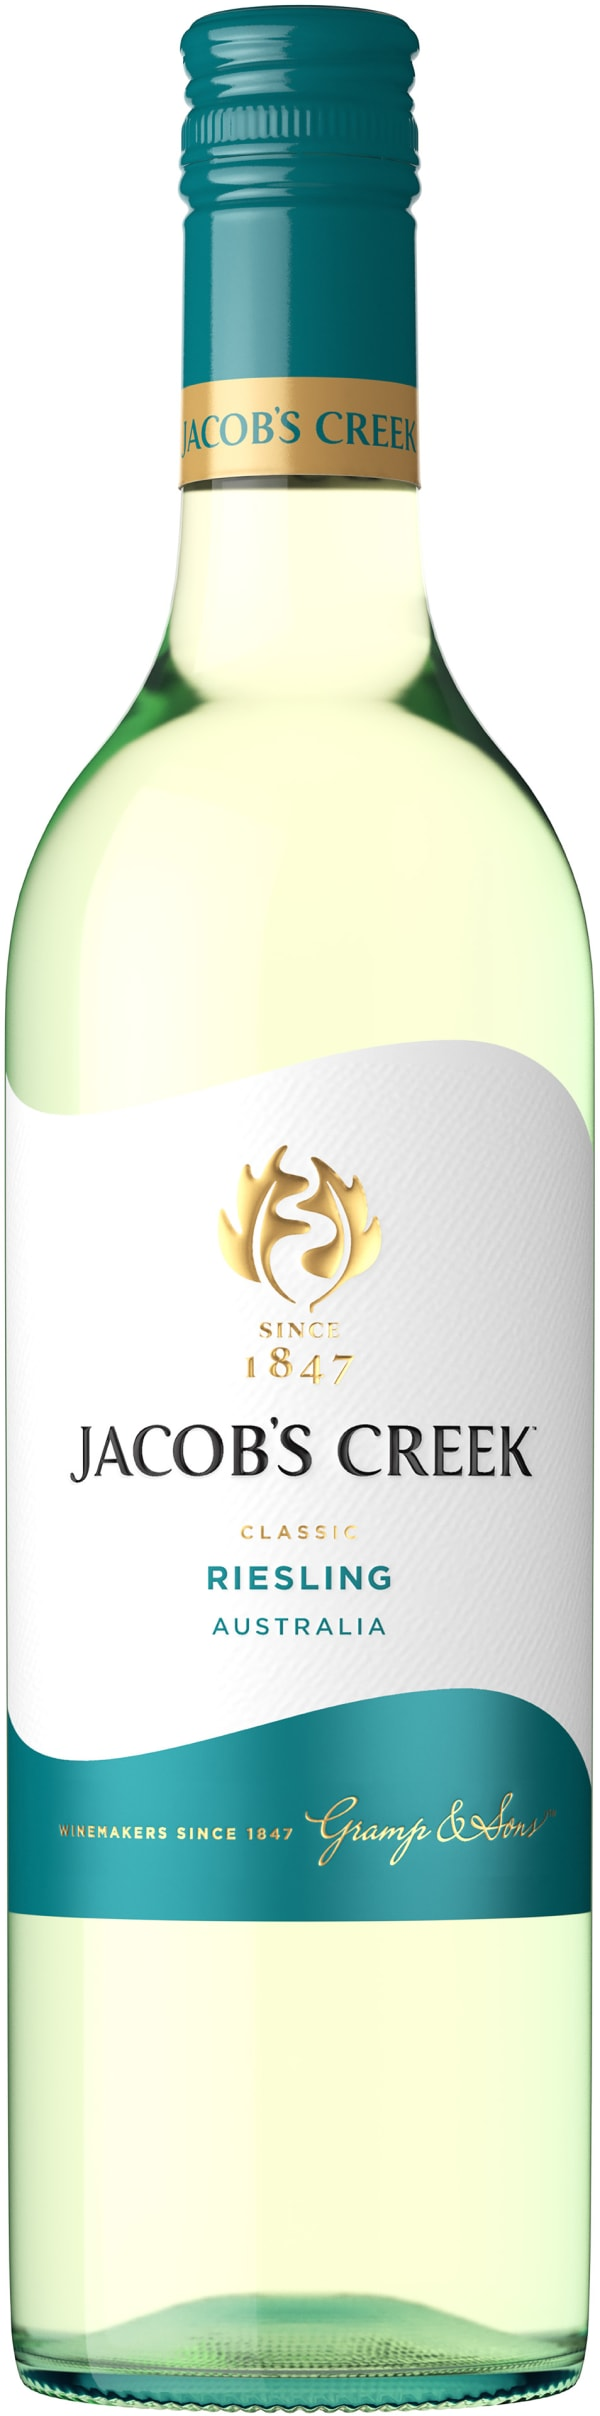 Jacob's Creek Riesling 2018